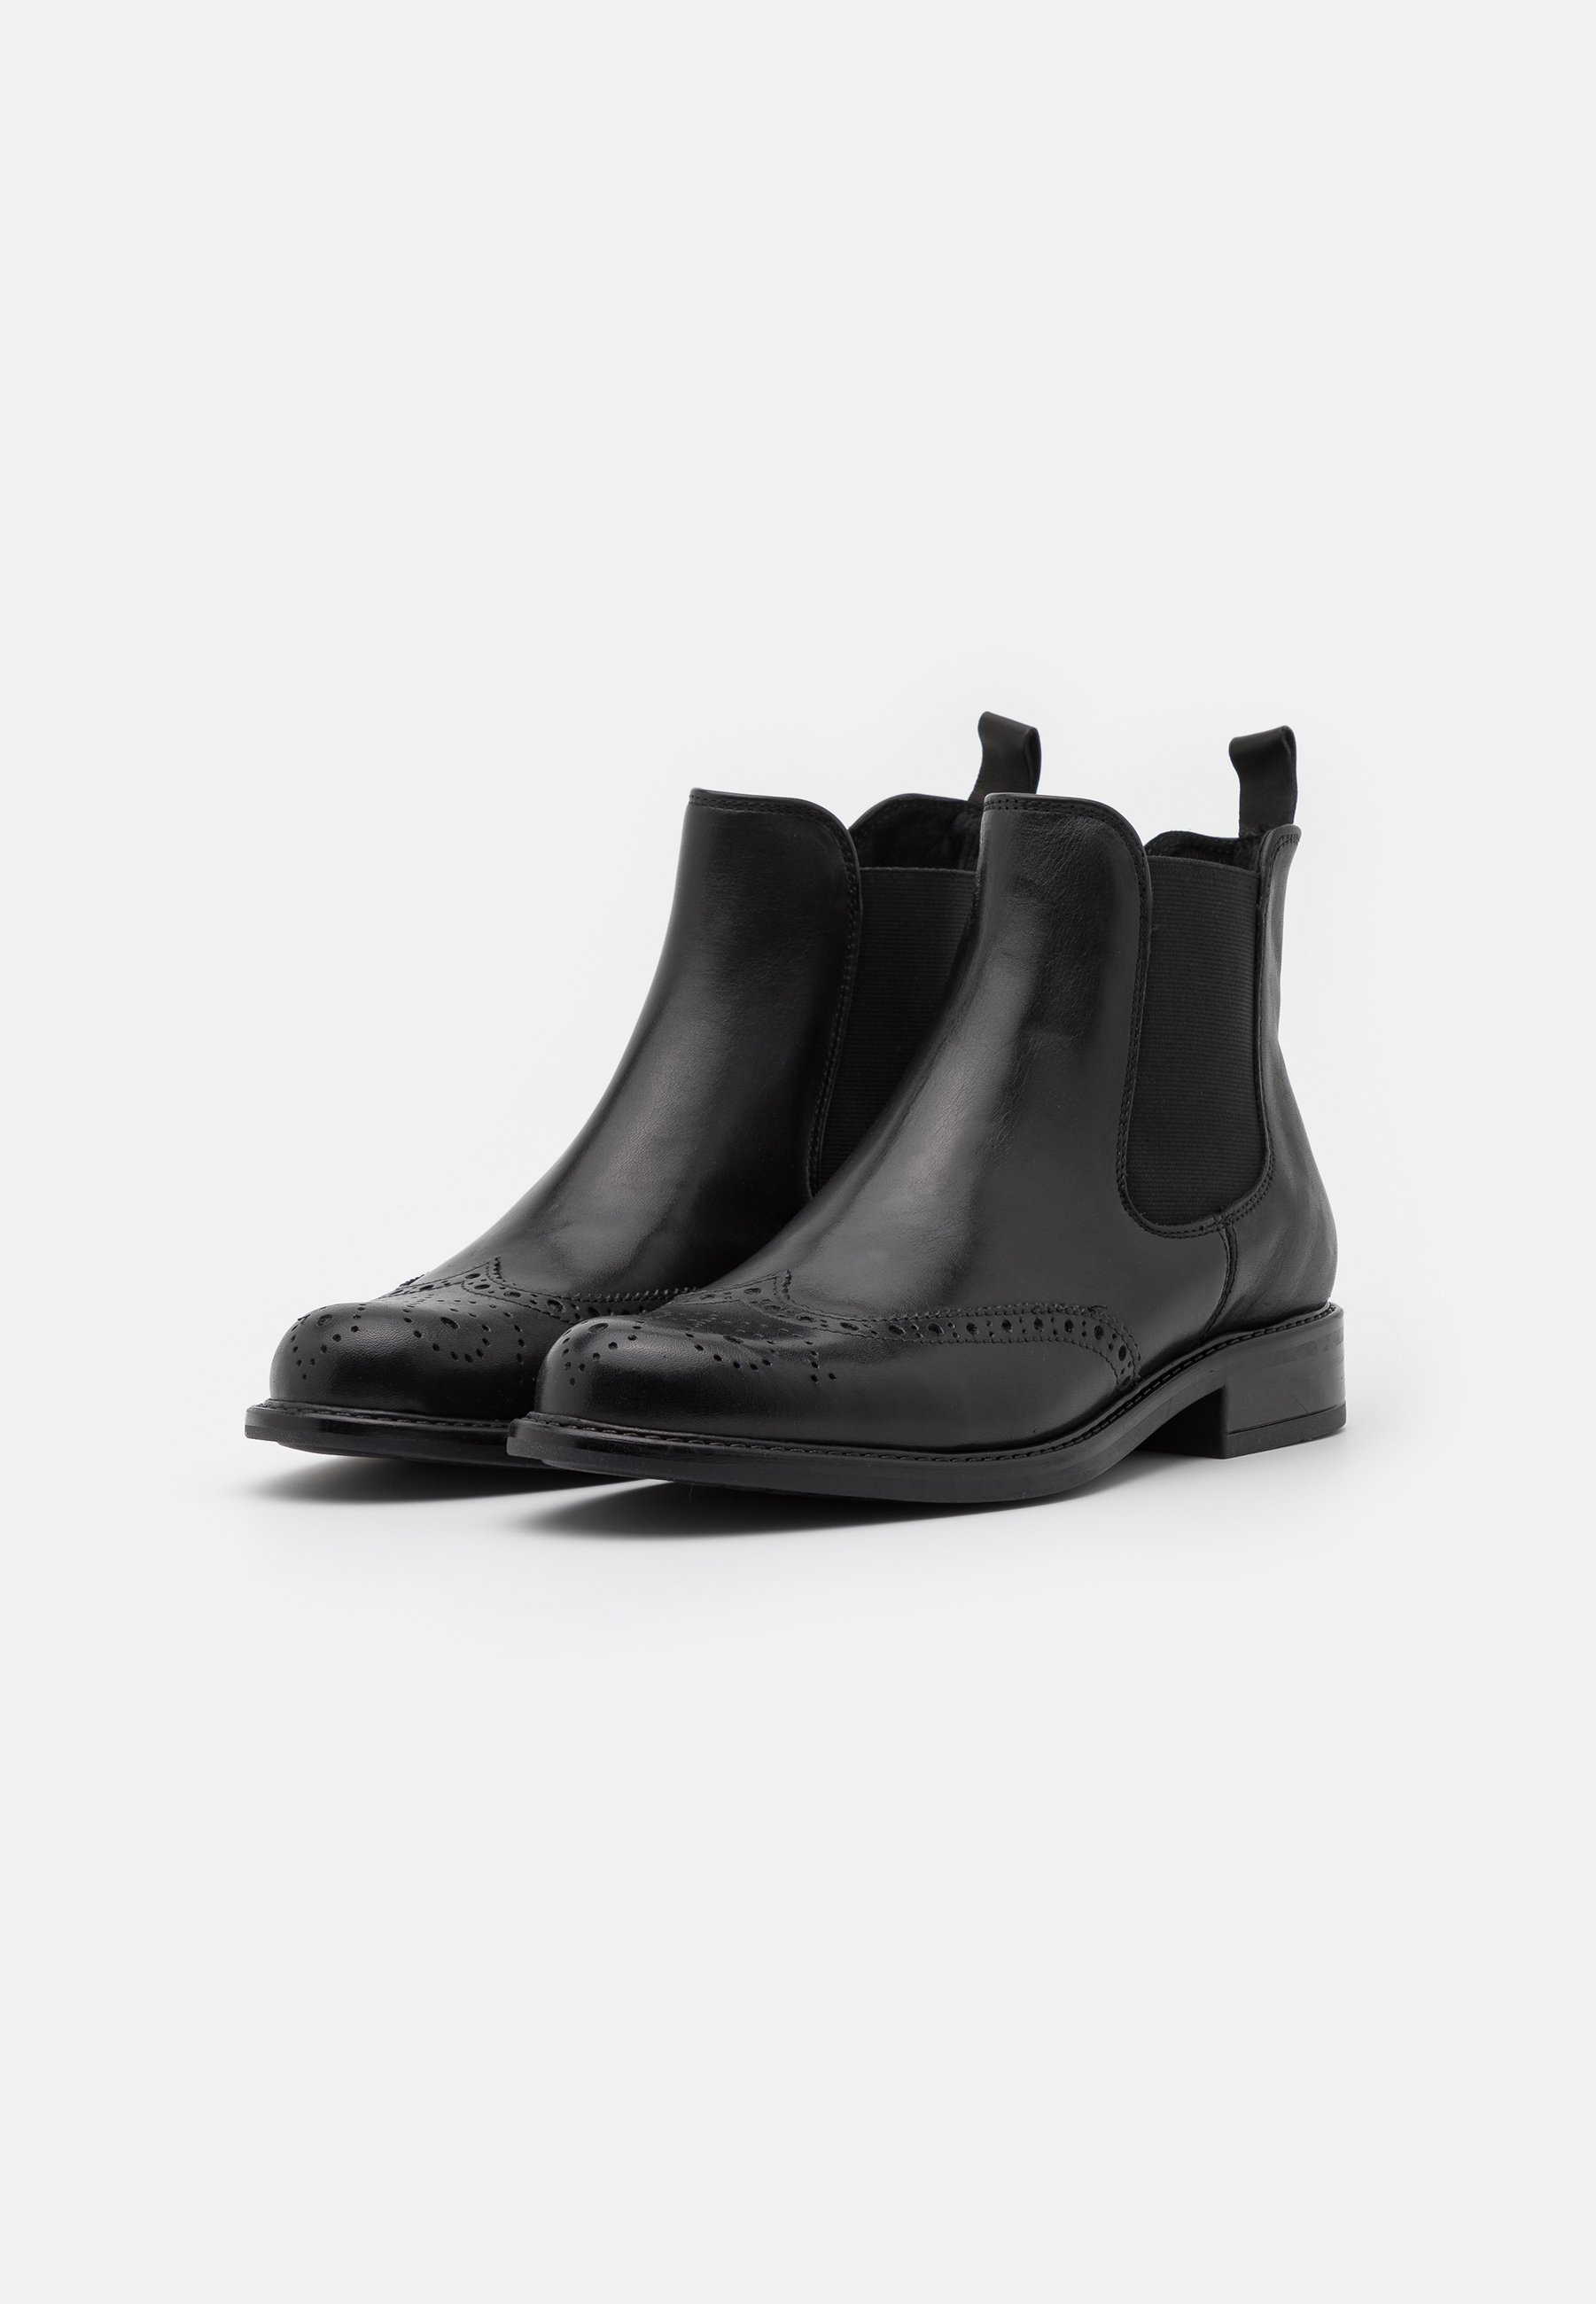 Jonak TRIM - Bottines - cuir/noir - Bottines Femme Designer